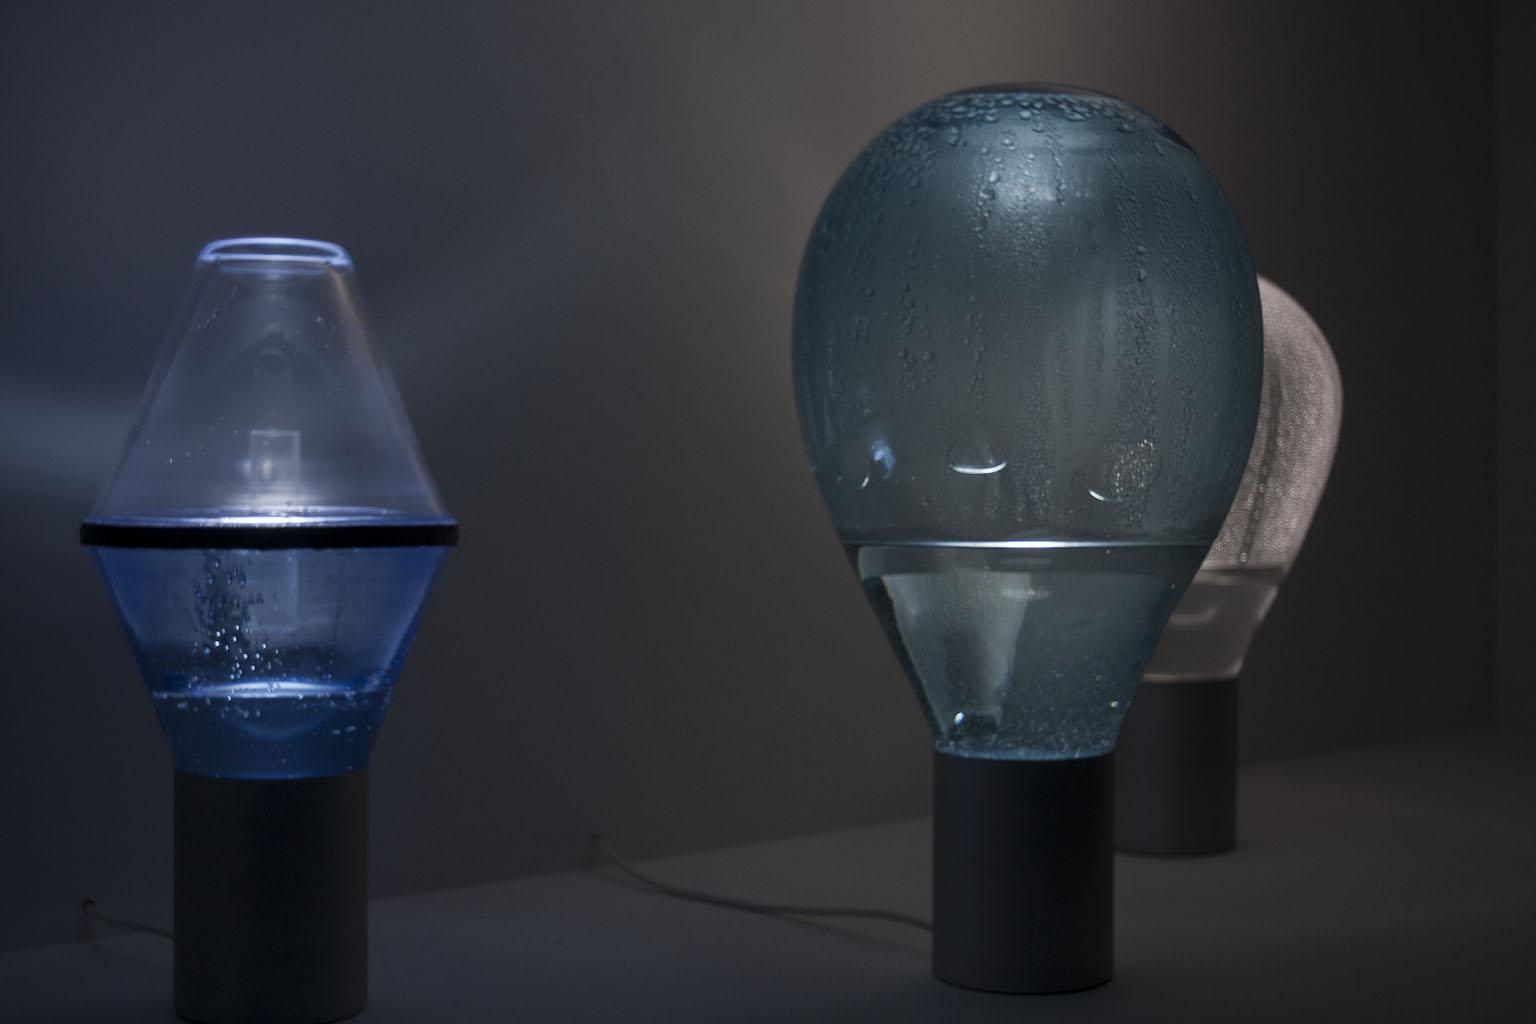 Atmos et Cumulus par le designer Arturo Erbsman